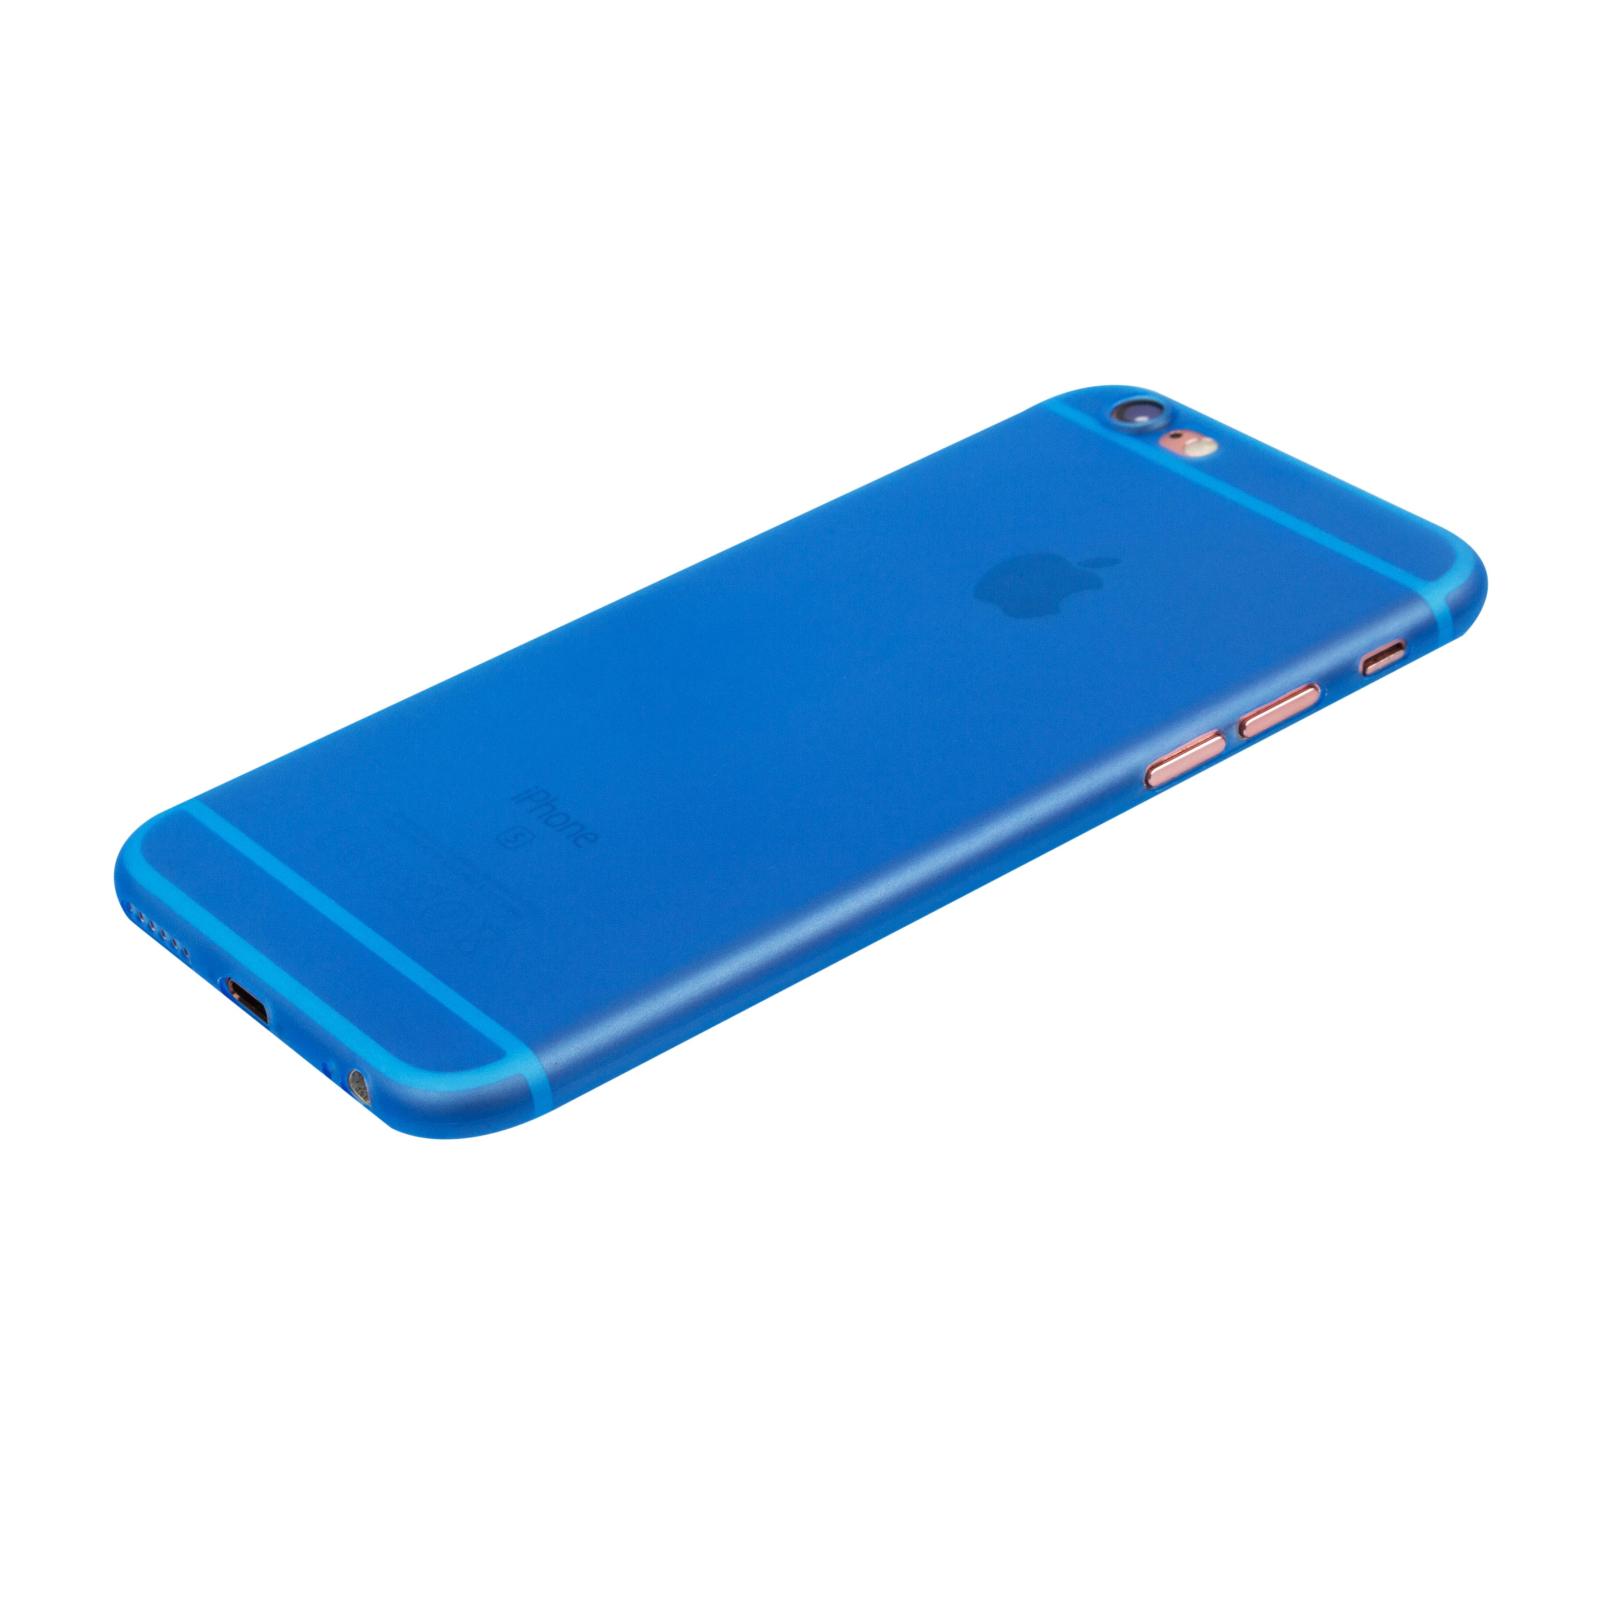 Чехол для моб. телефона MakeFuture Ice Case (PP) для Apple iPhone 6 Blue (MCI-AI6BL) изображение 6